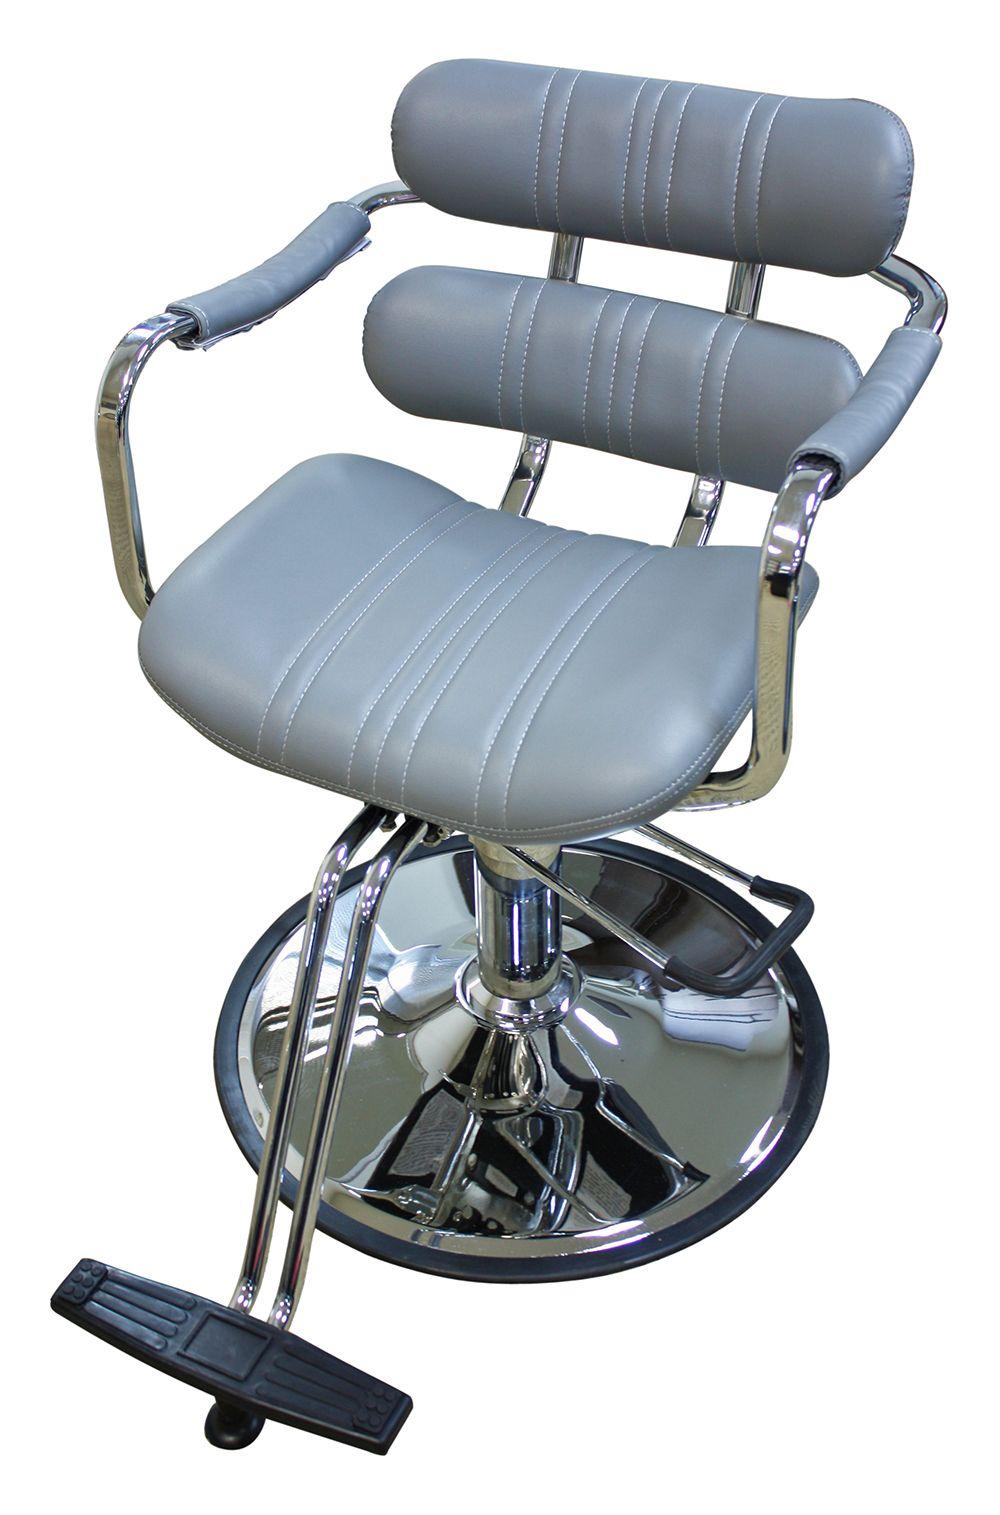 Amazing Cc 2121 Kendra Styling Chair Free Shipping Salon Ideas Interior Design Ideas Clesiryabchikinfo